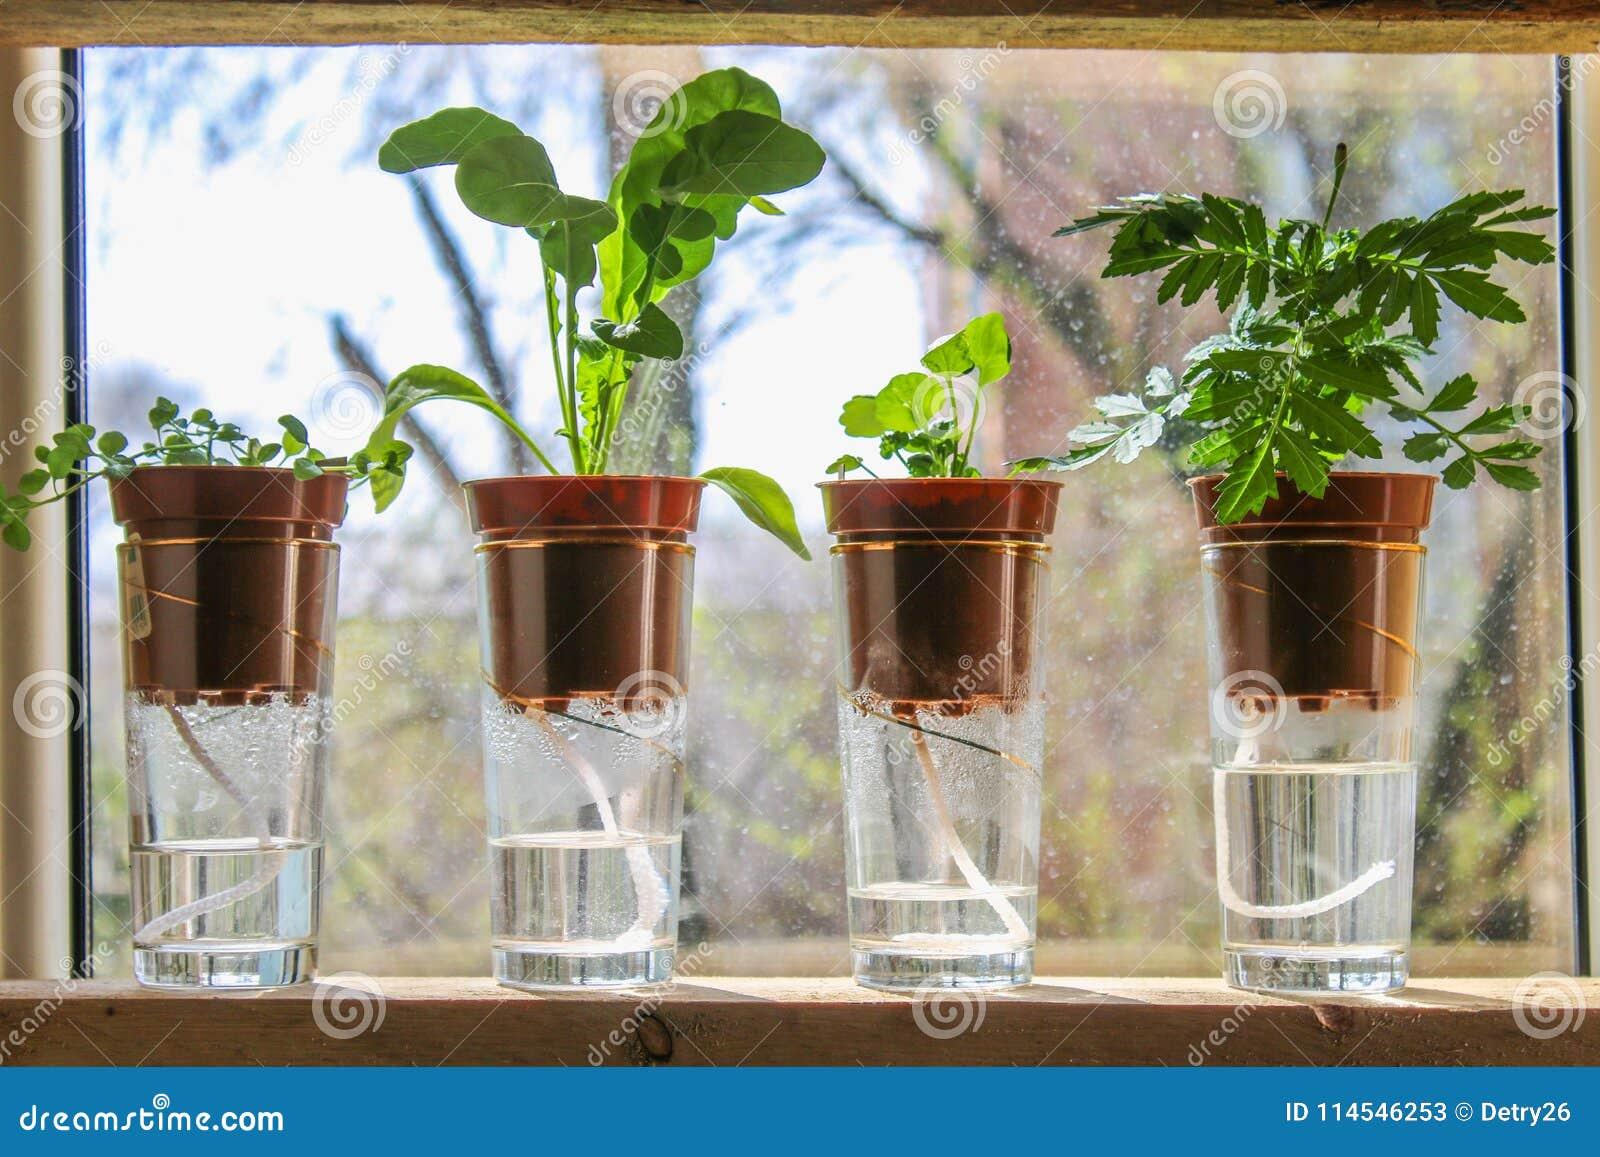 Wick watering. Plants in pots on glasses stand on a shelf on a window.